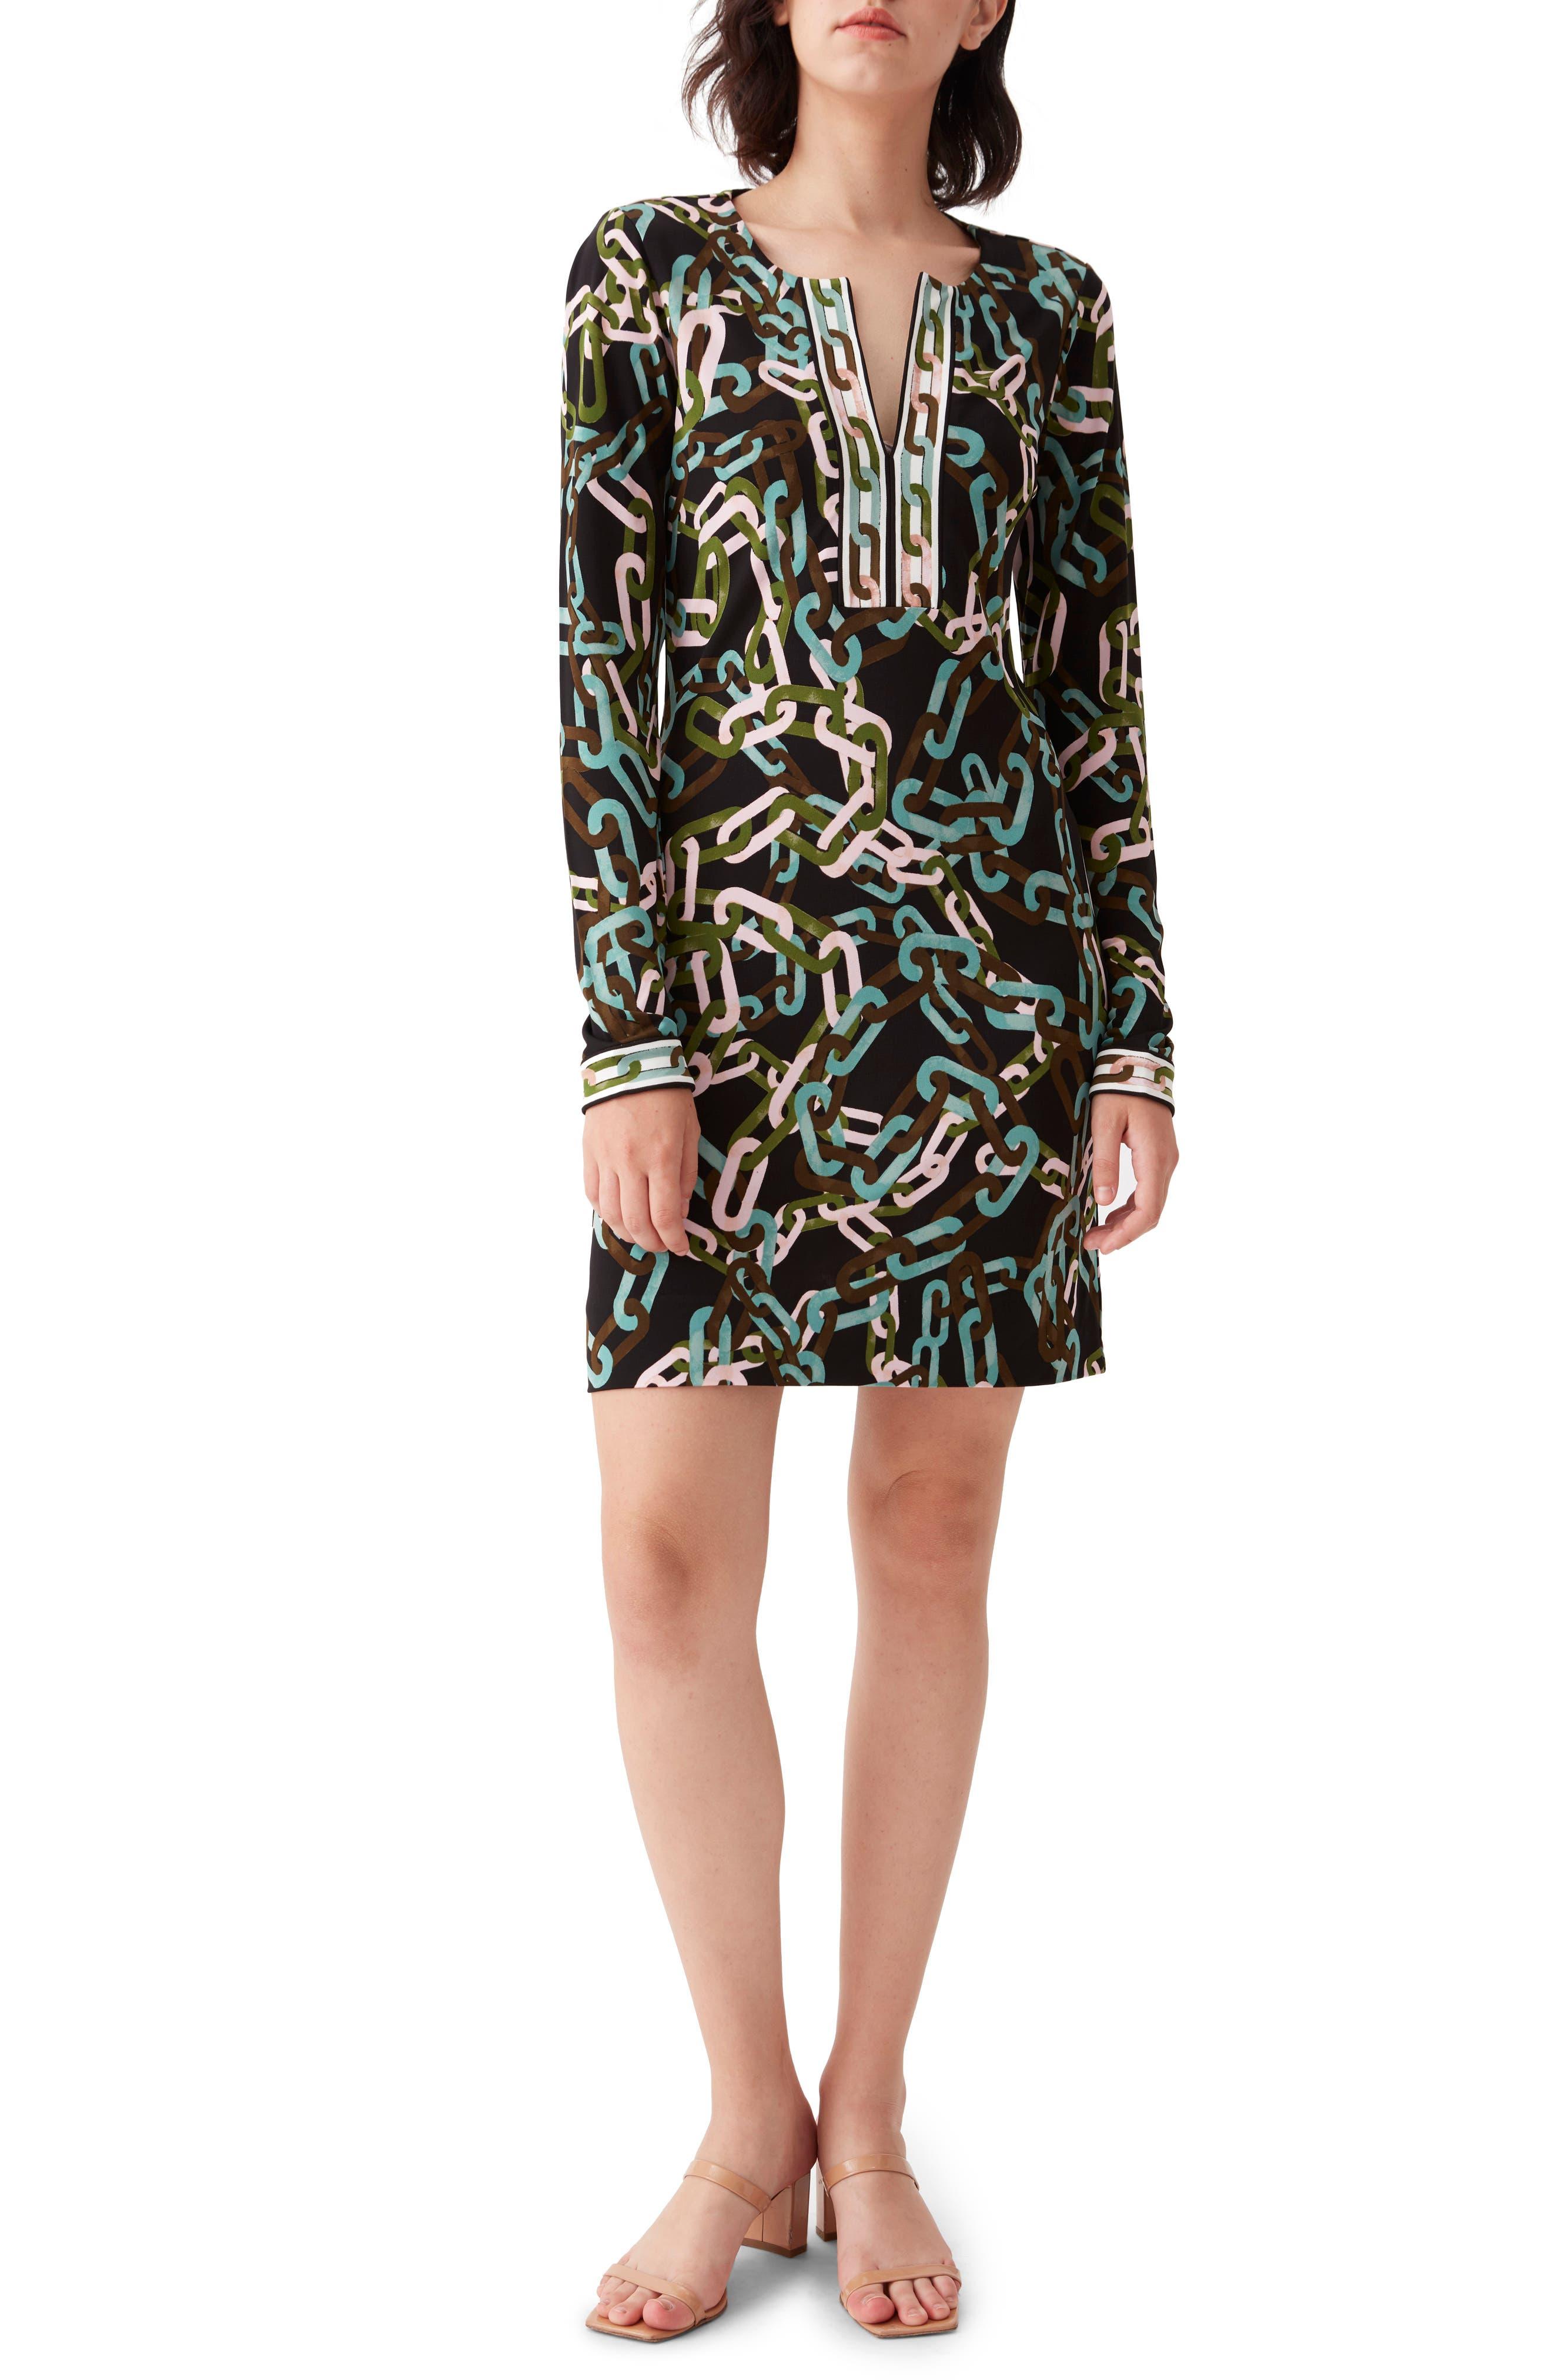 Reina Chain Print Long Sleeve Dress